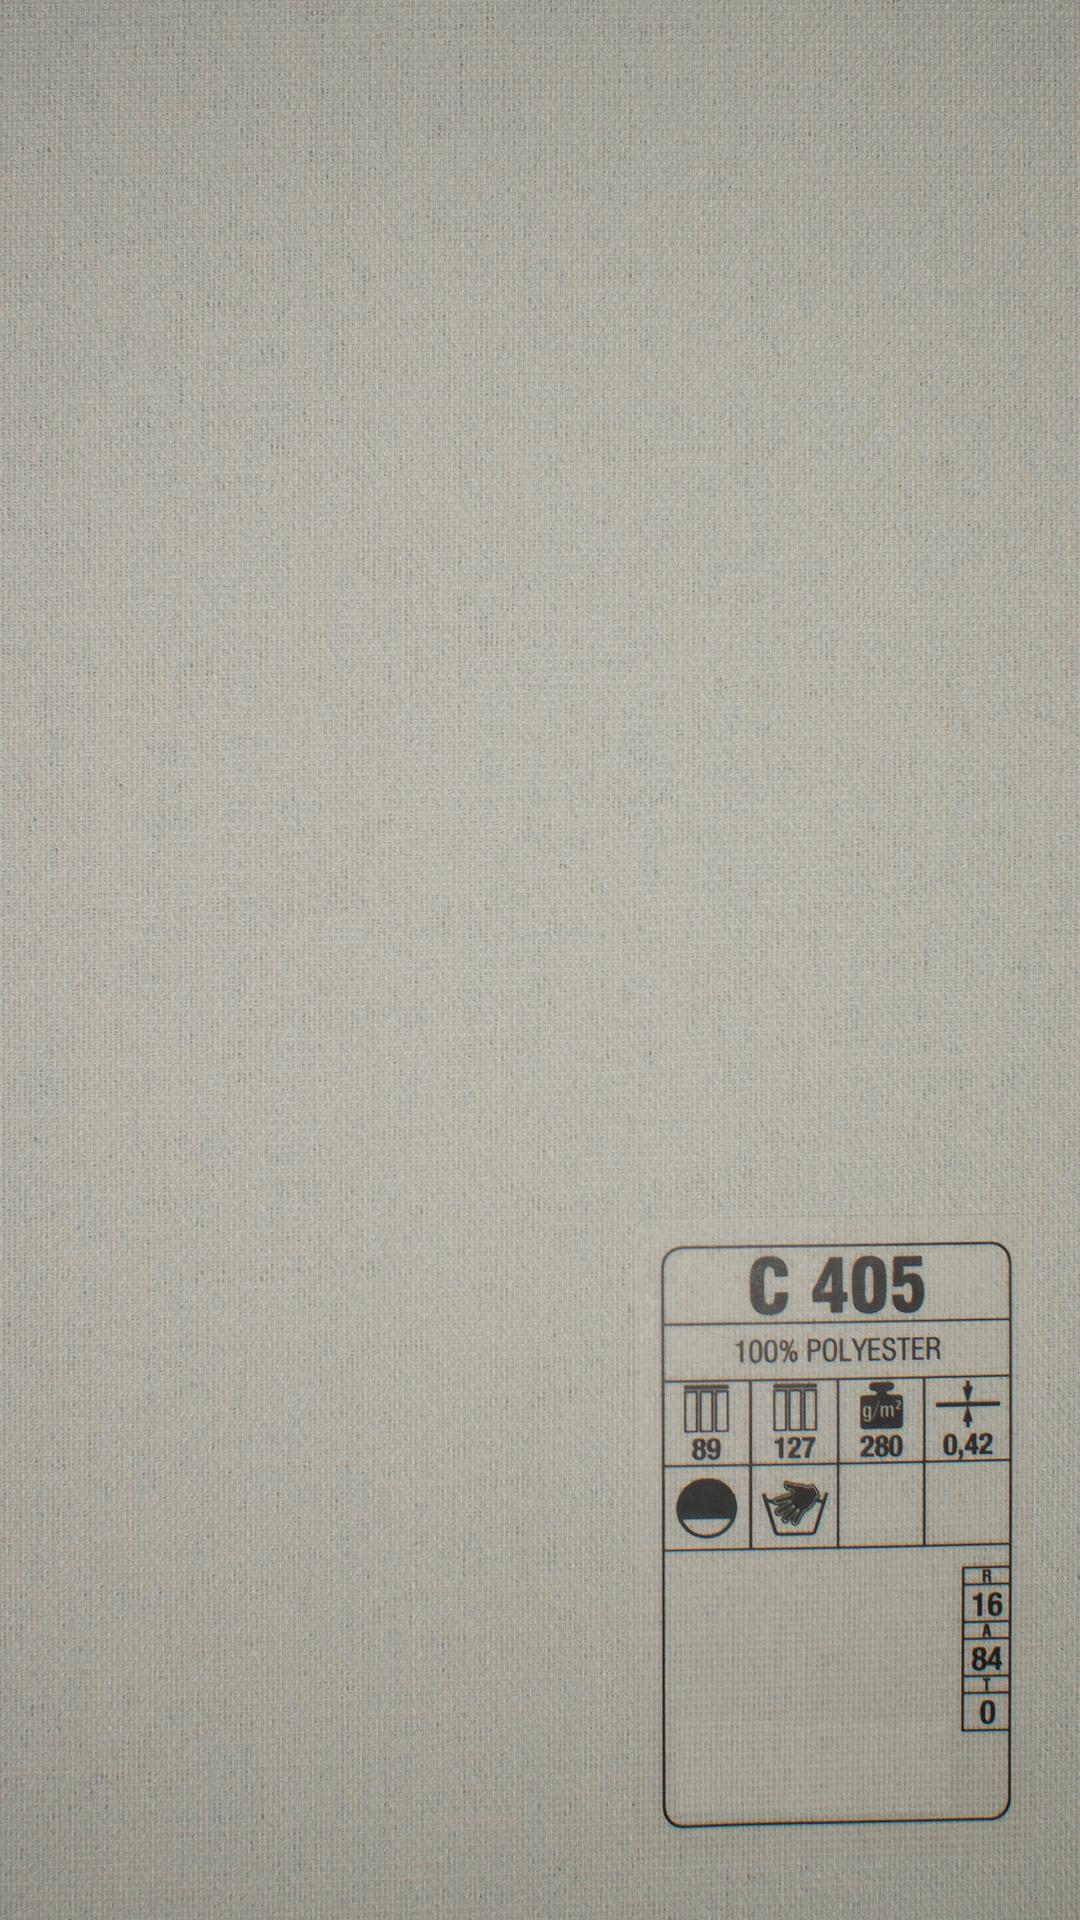 C 405